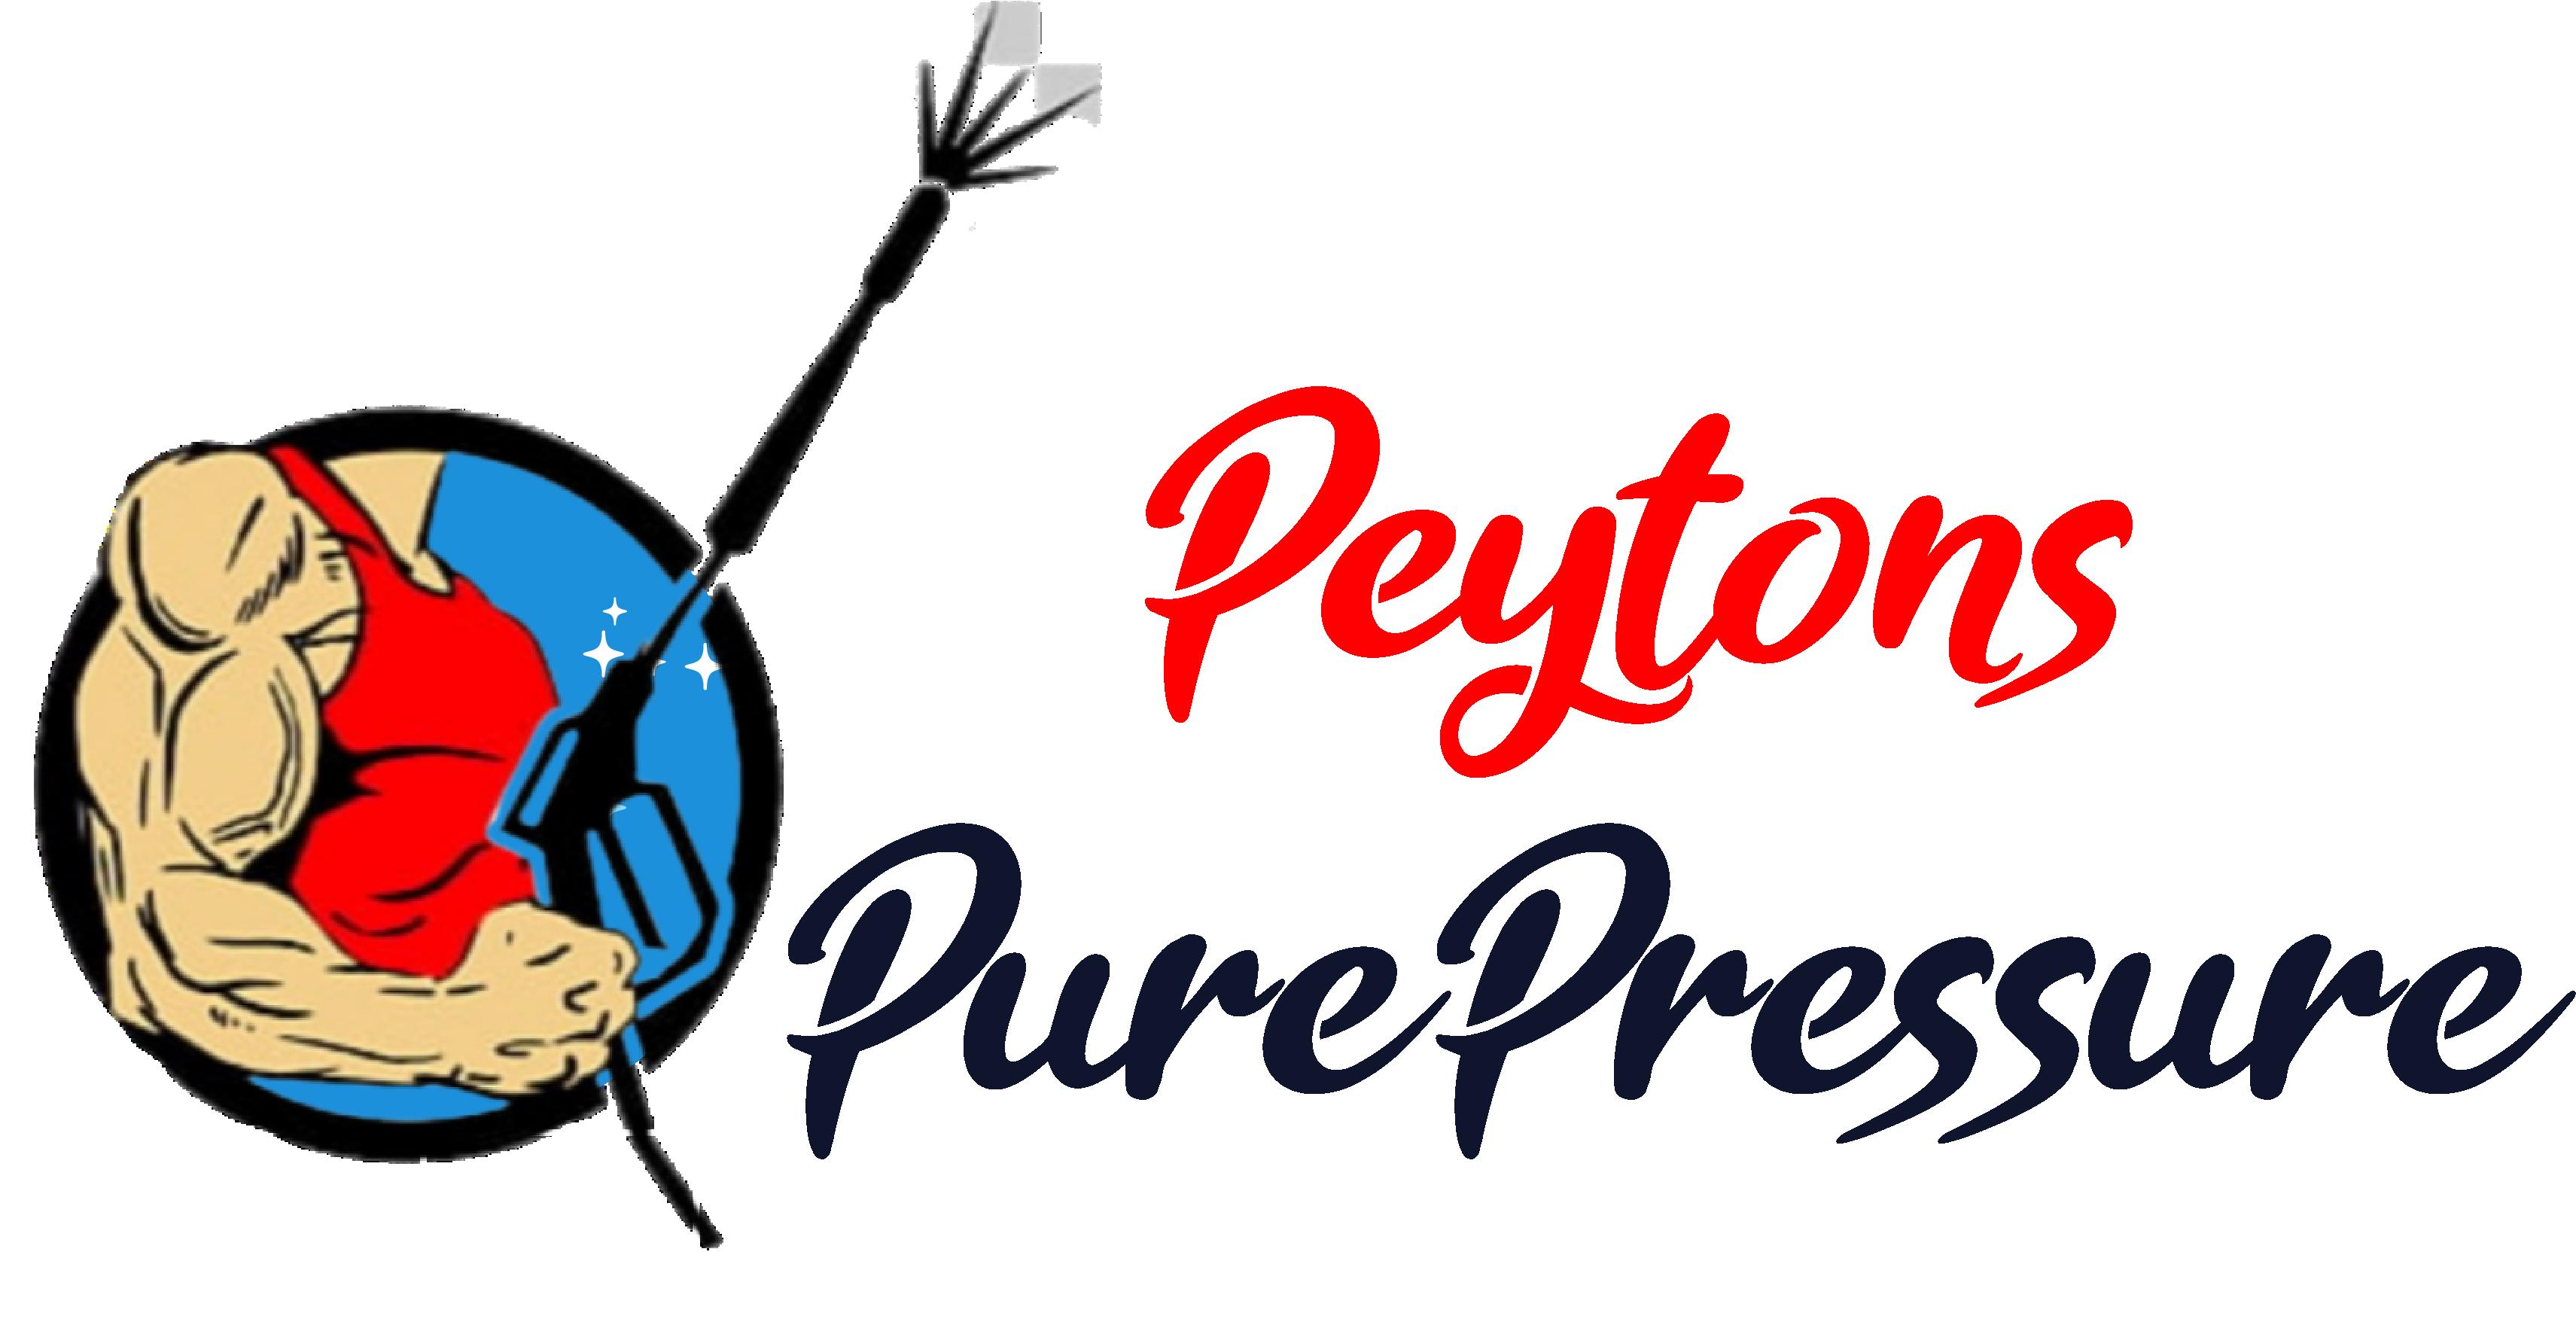 Peytons Pure Pressure